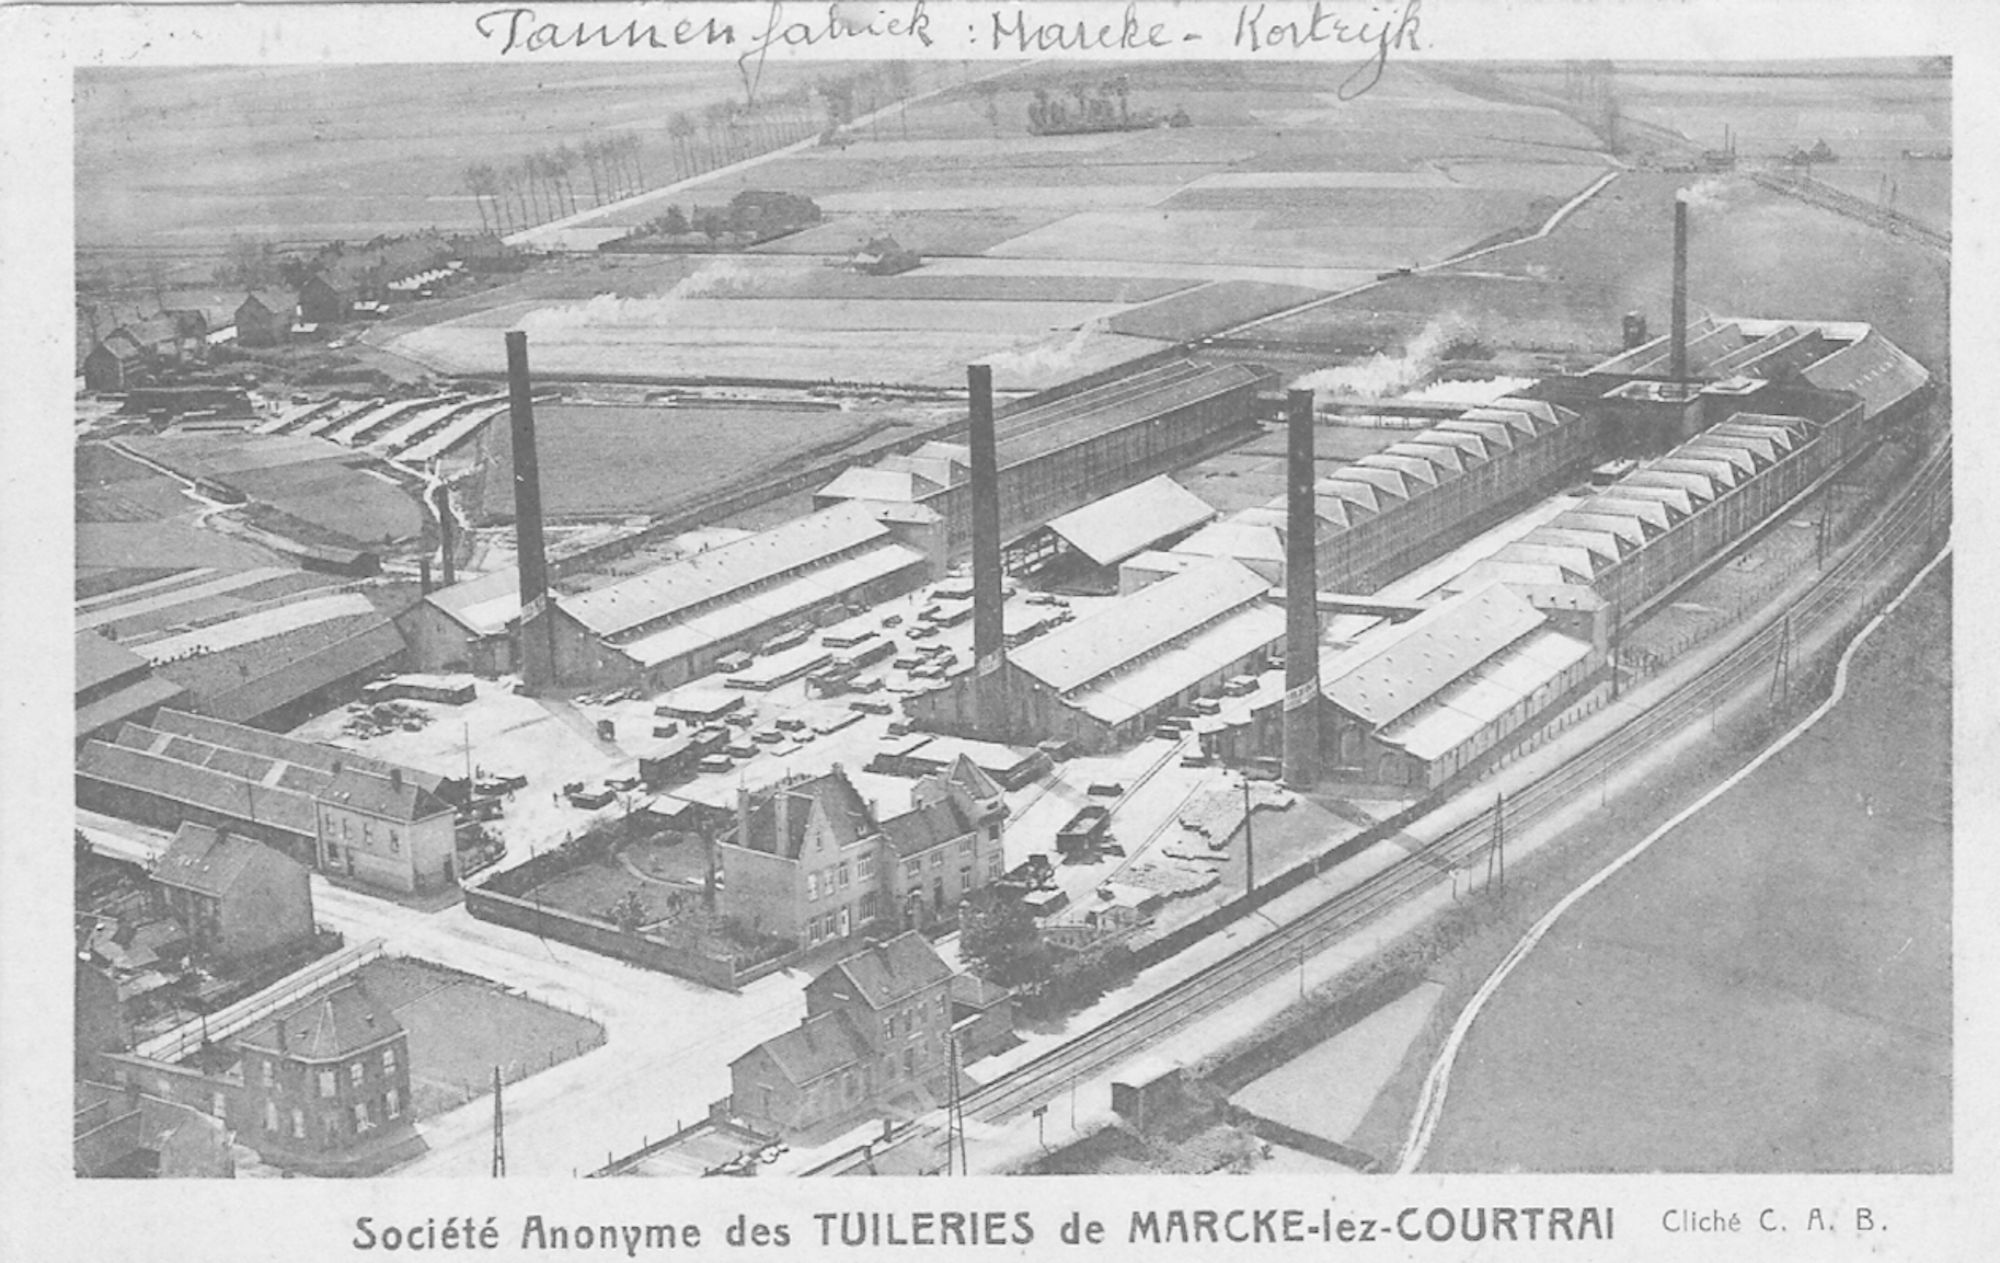 Pannenfabriek 'Tuileries de Marcke'